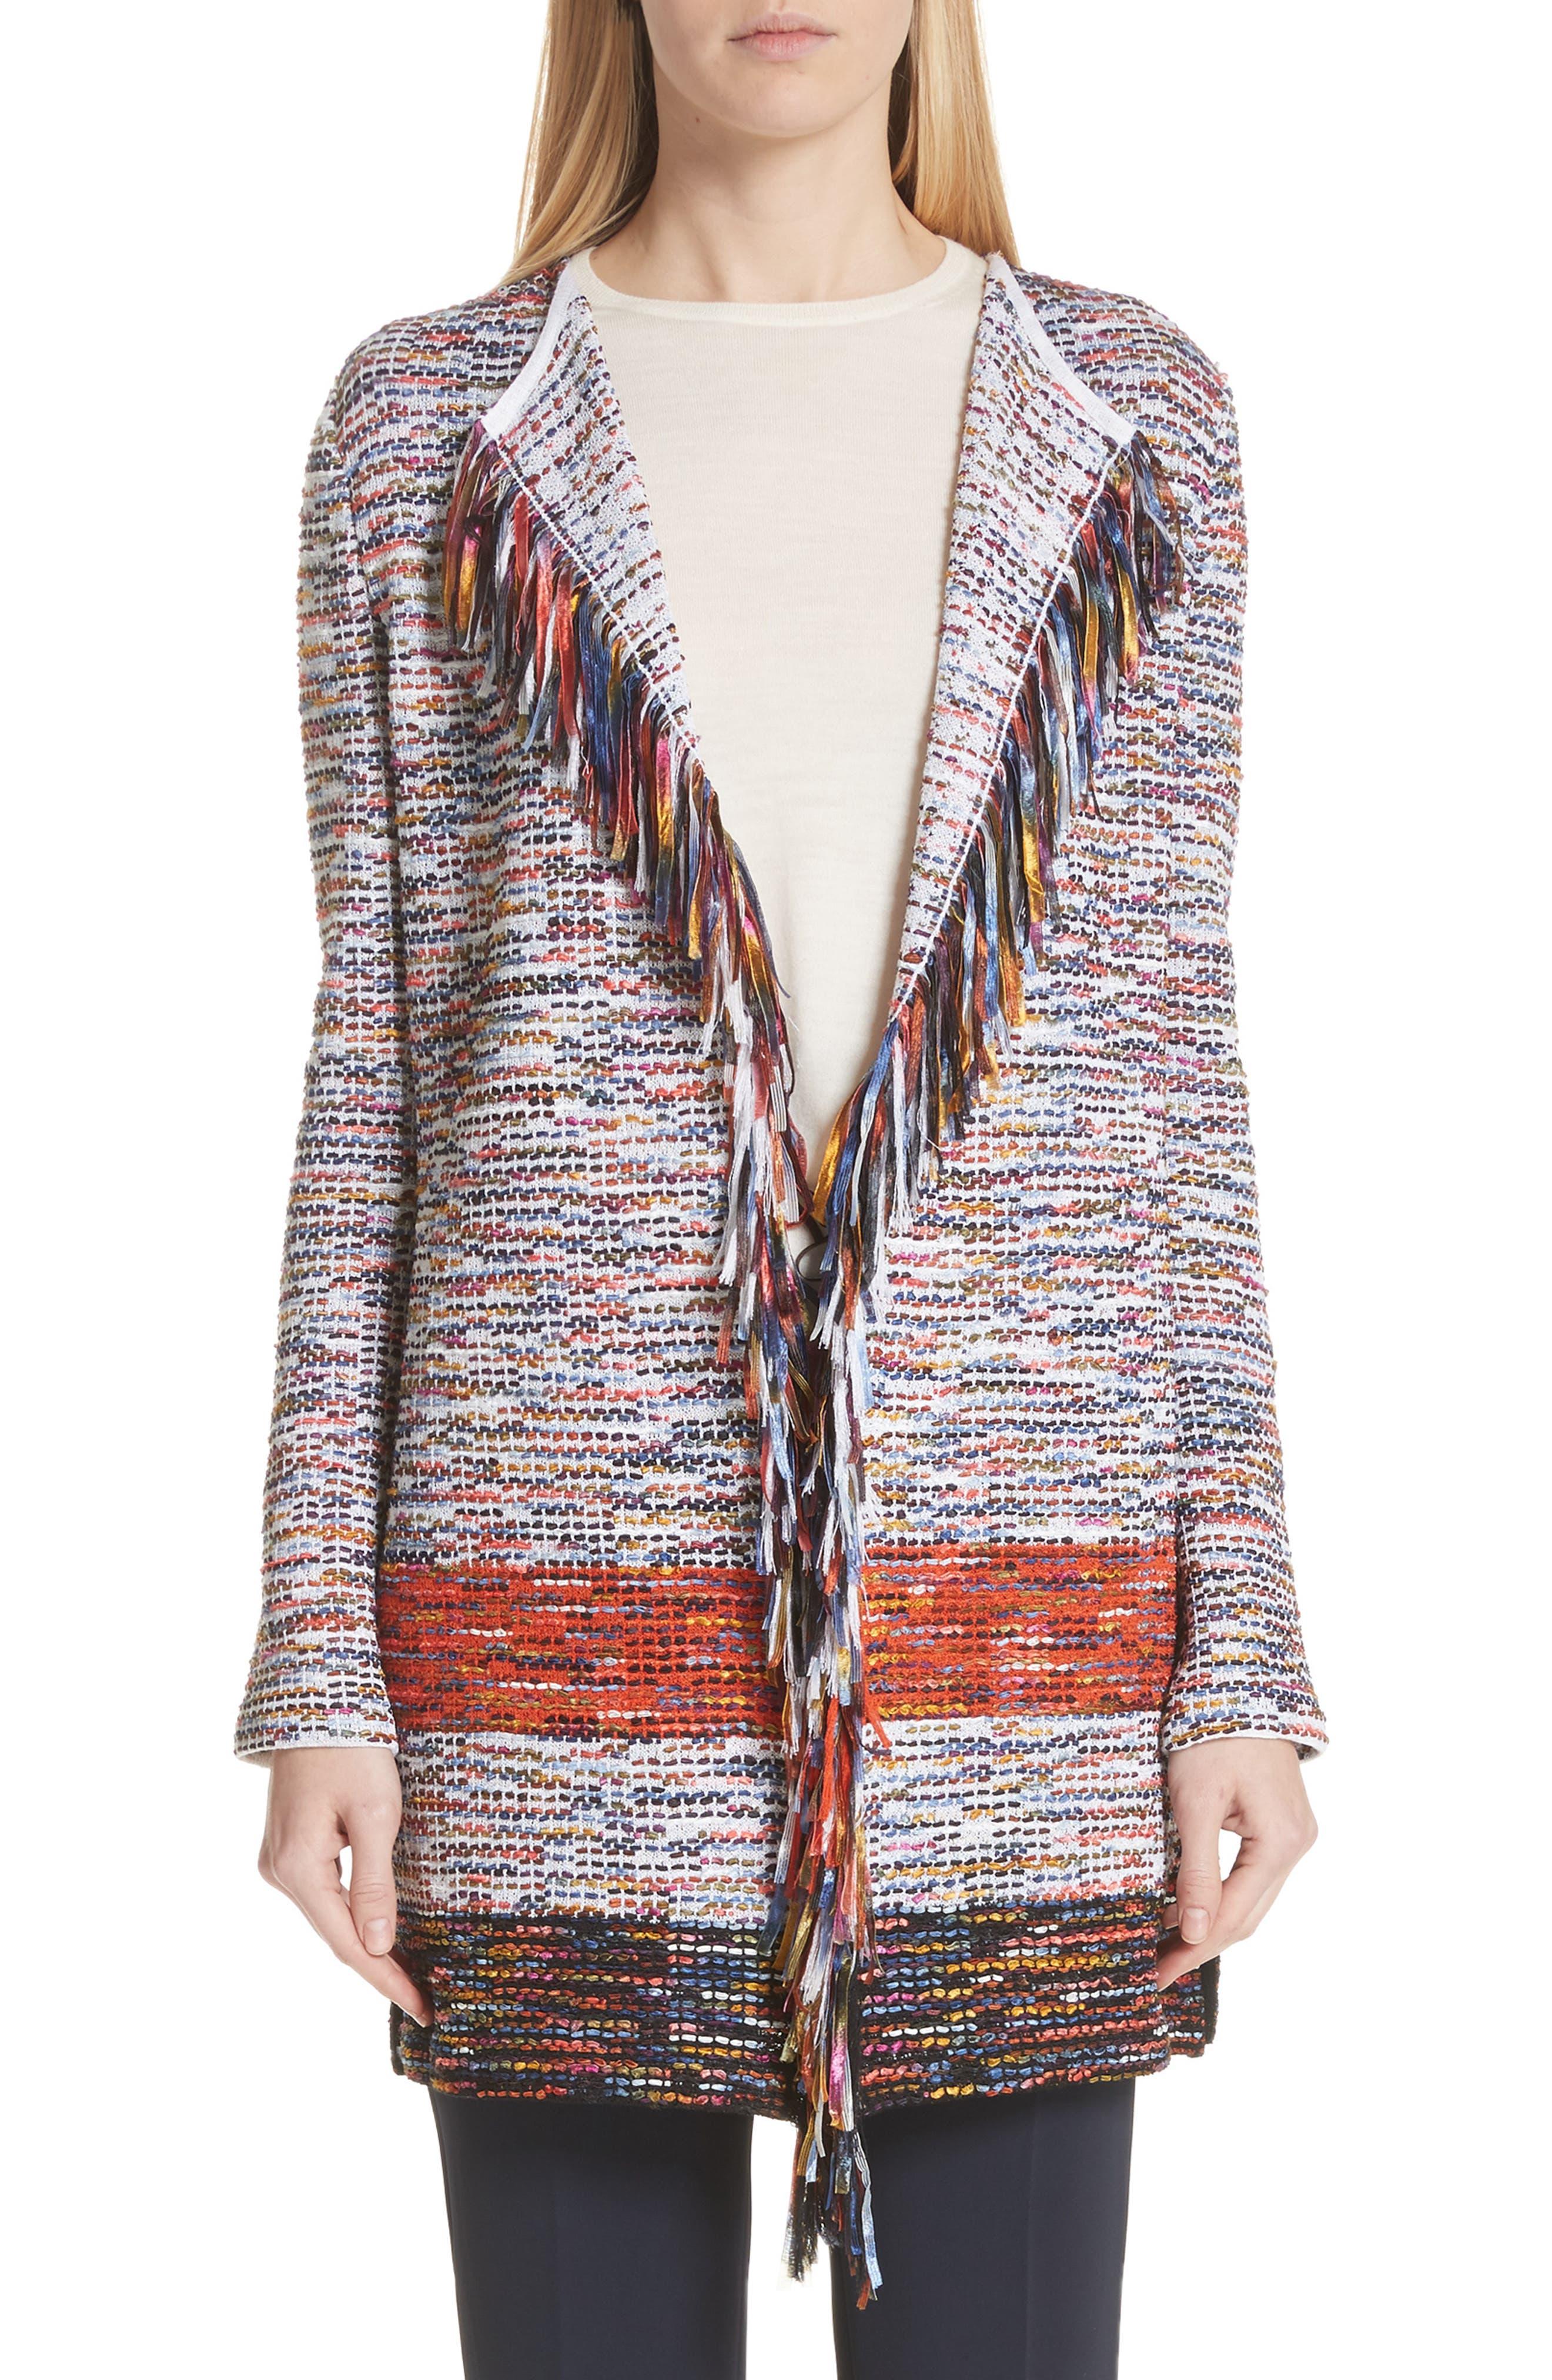 St. John Collection Vertical Fringe Multi Tweed Knit Waterfall Cardigan